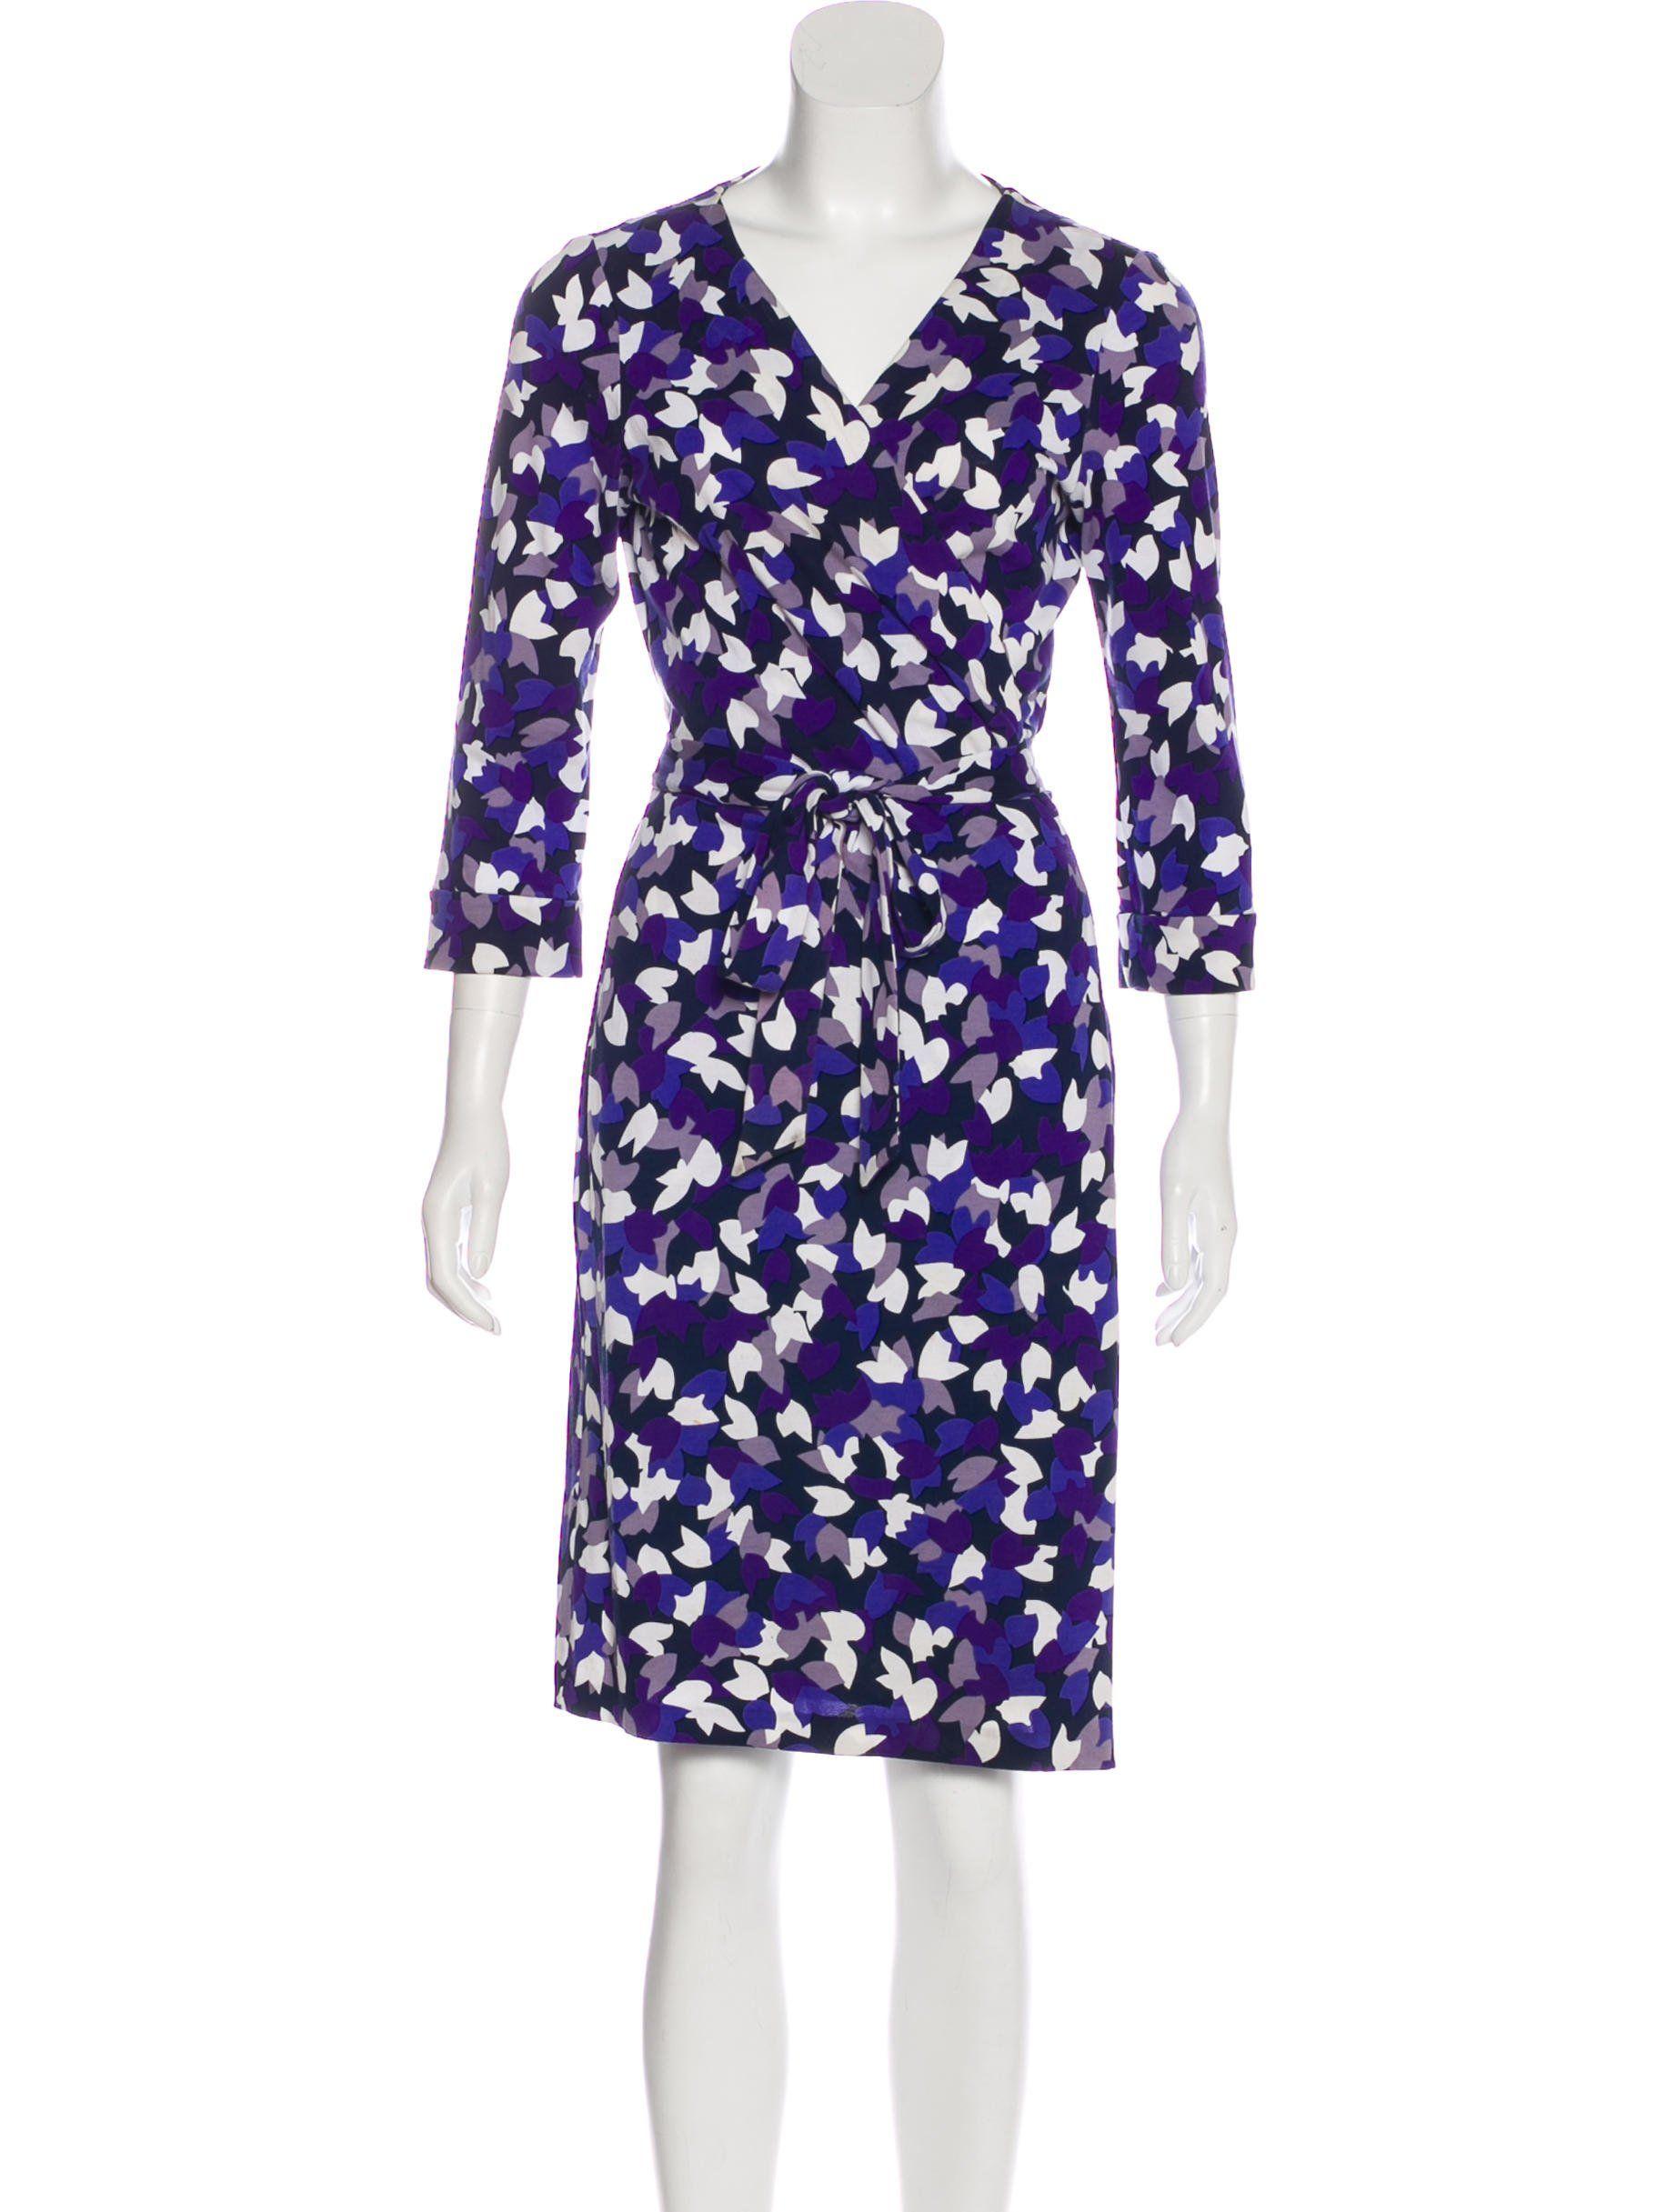 Blue Purple And White Diane Von Furstenberg Wrap Dress With Pattern Throughout And Sash Tie Clos Wrap Dress Purple Wrap Dress Diane Von Furstenberg Wrap Dress [ 2433 x 1844 Pixel ]